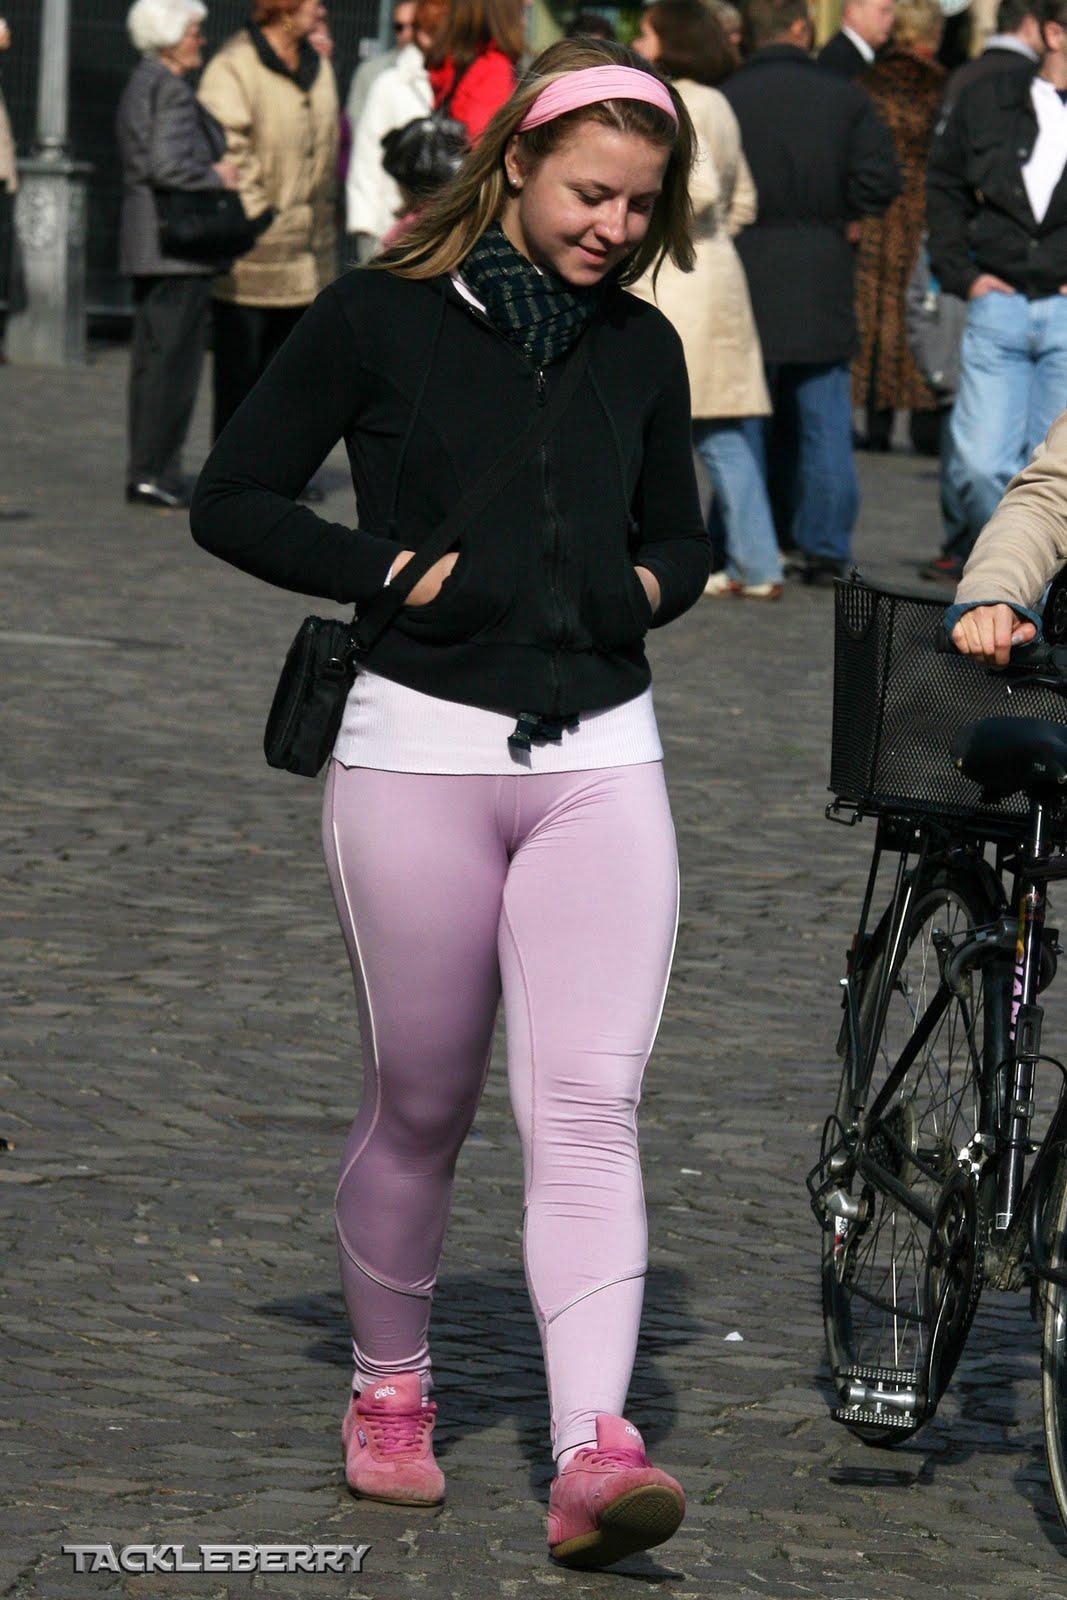 Jovencita nalgona en jeans prueba - 2 4